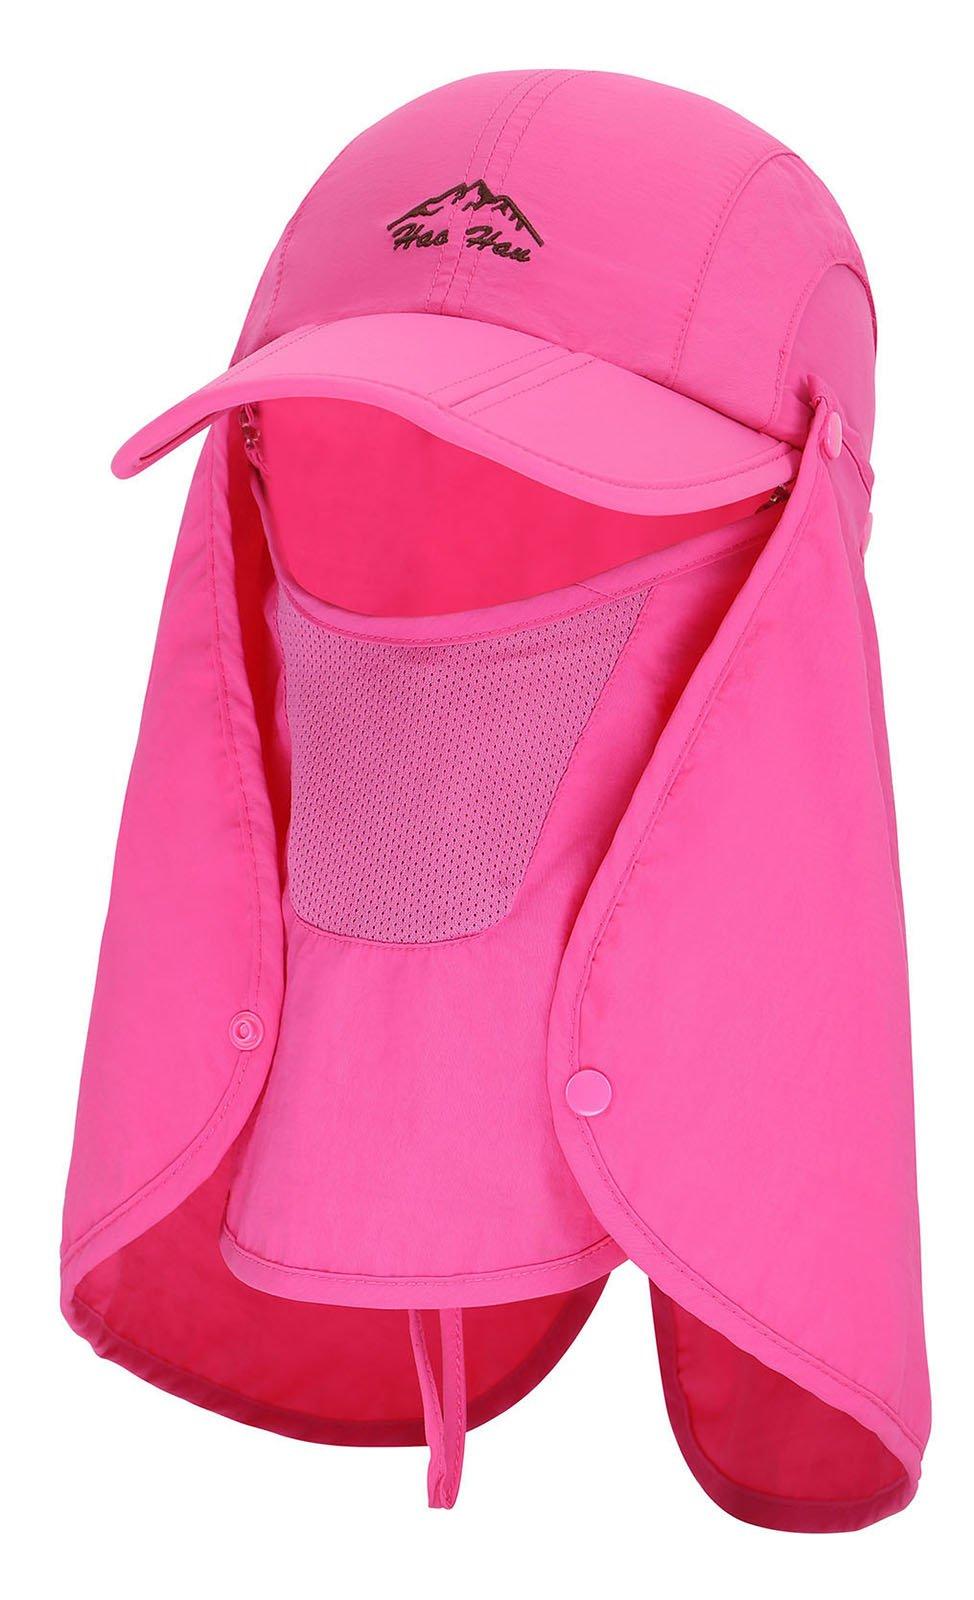 EPYA Flap Hat UPF 50+ UV Sun Protection Wind Proof Cap w/Neck & Face Cover,Rose